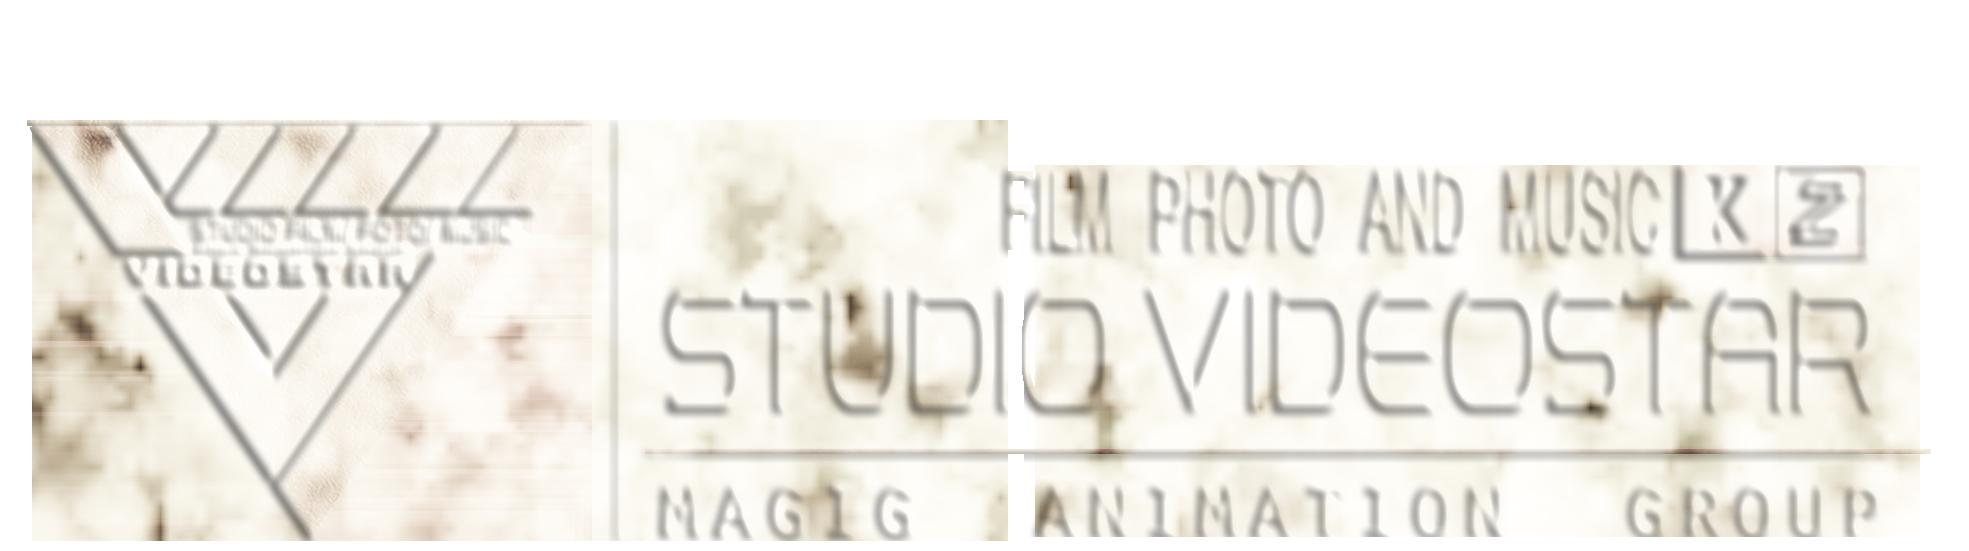 STUDIO VIDEOSTAR / Film,Music and Foto